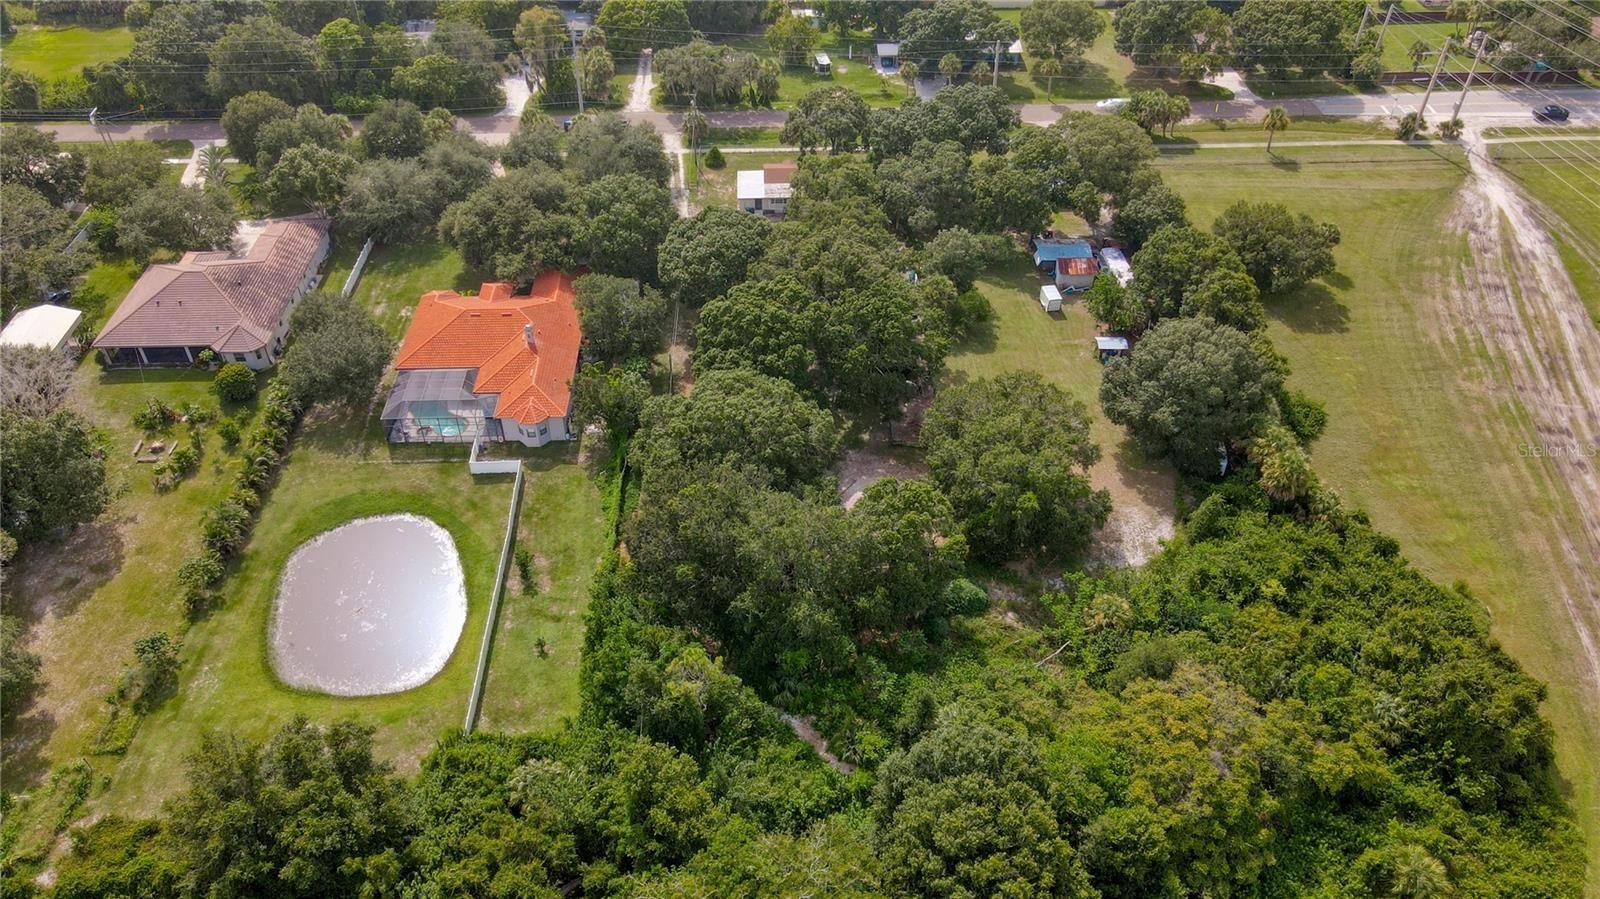 Photo of 720 OLD ALBEE FARM ROAD, NOKOMIS, FL 34275 (MLS # A4511184)